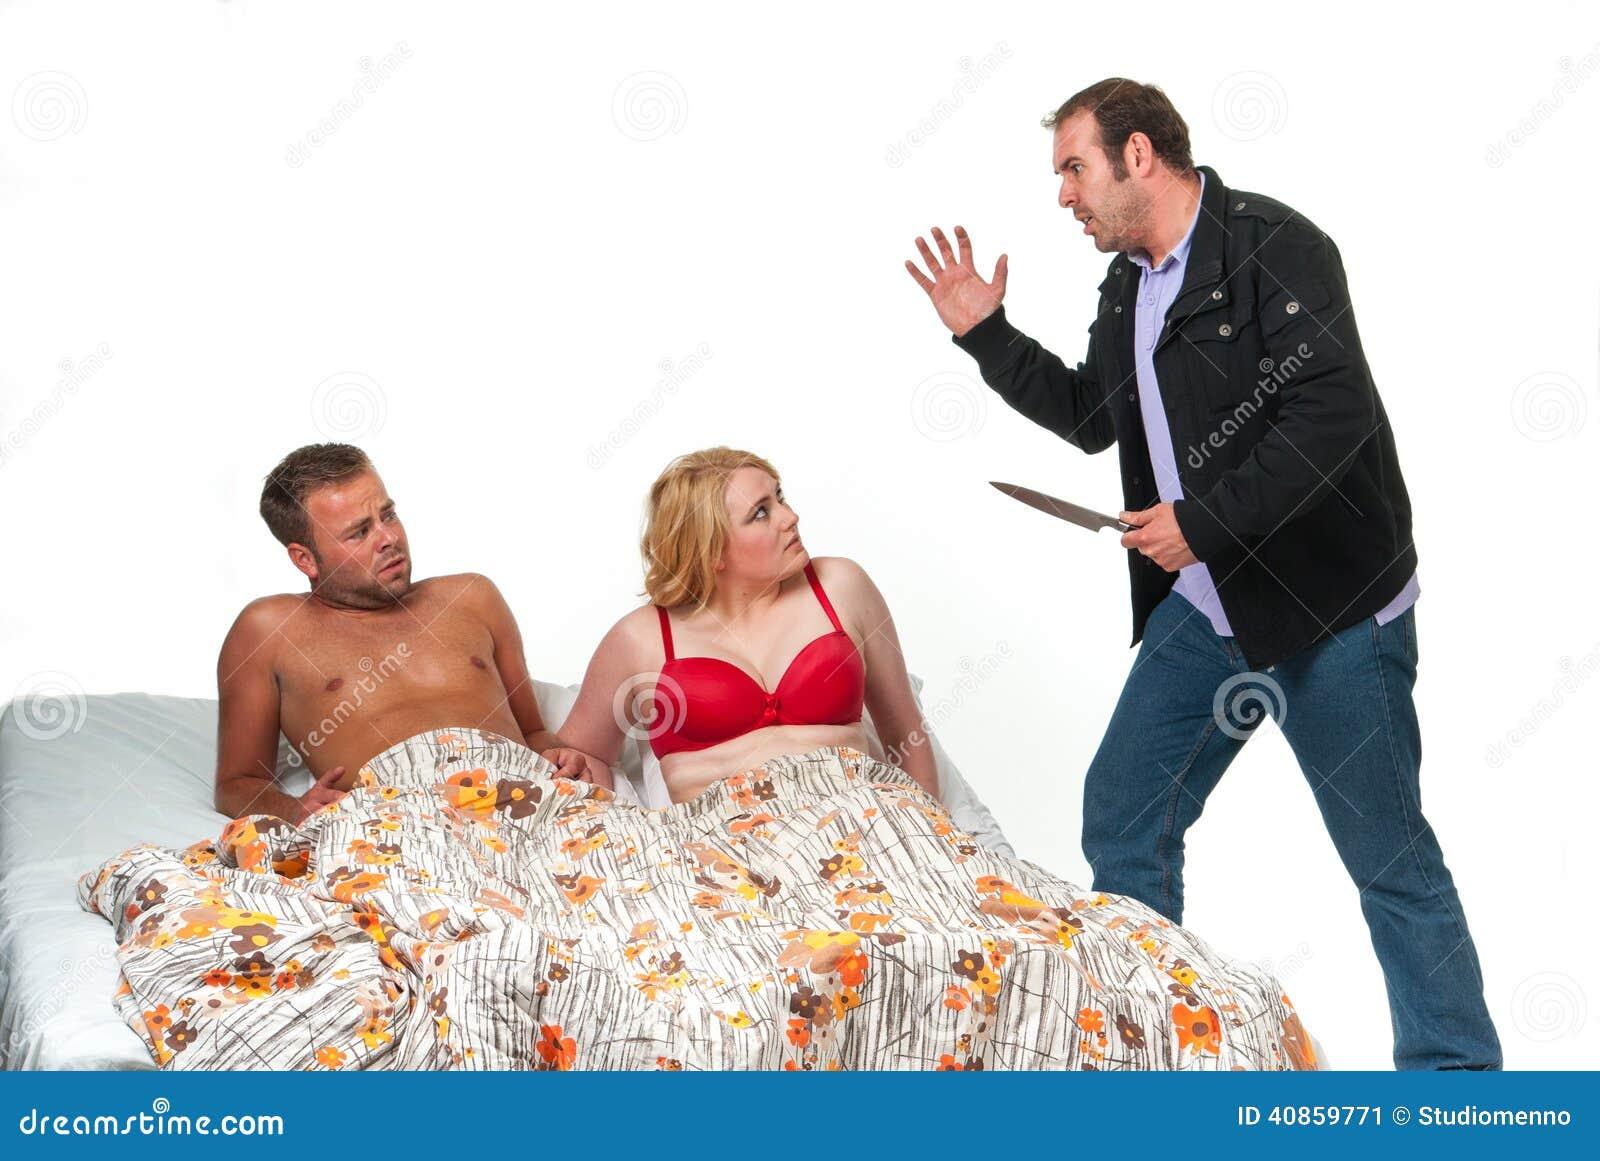 Жена на кровати фото смотреть онлайн фотоография